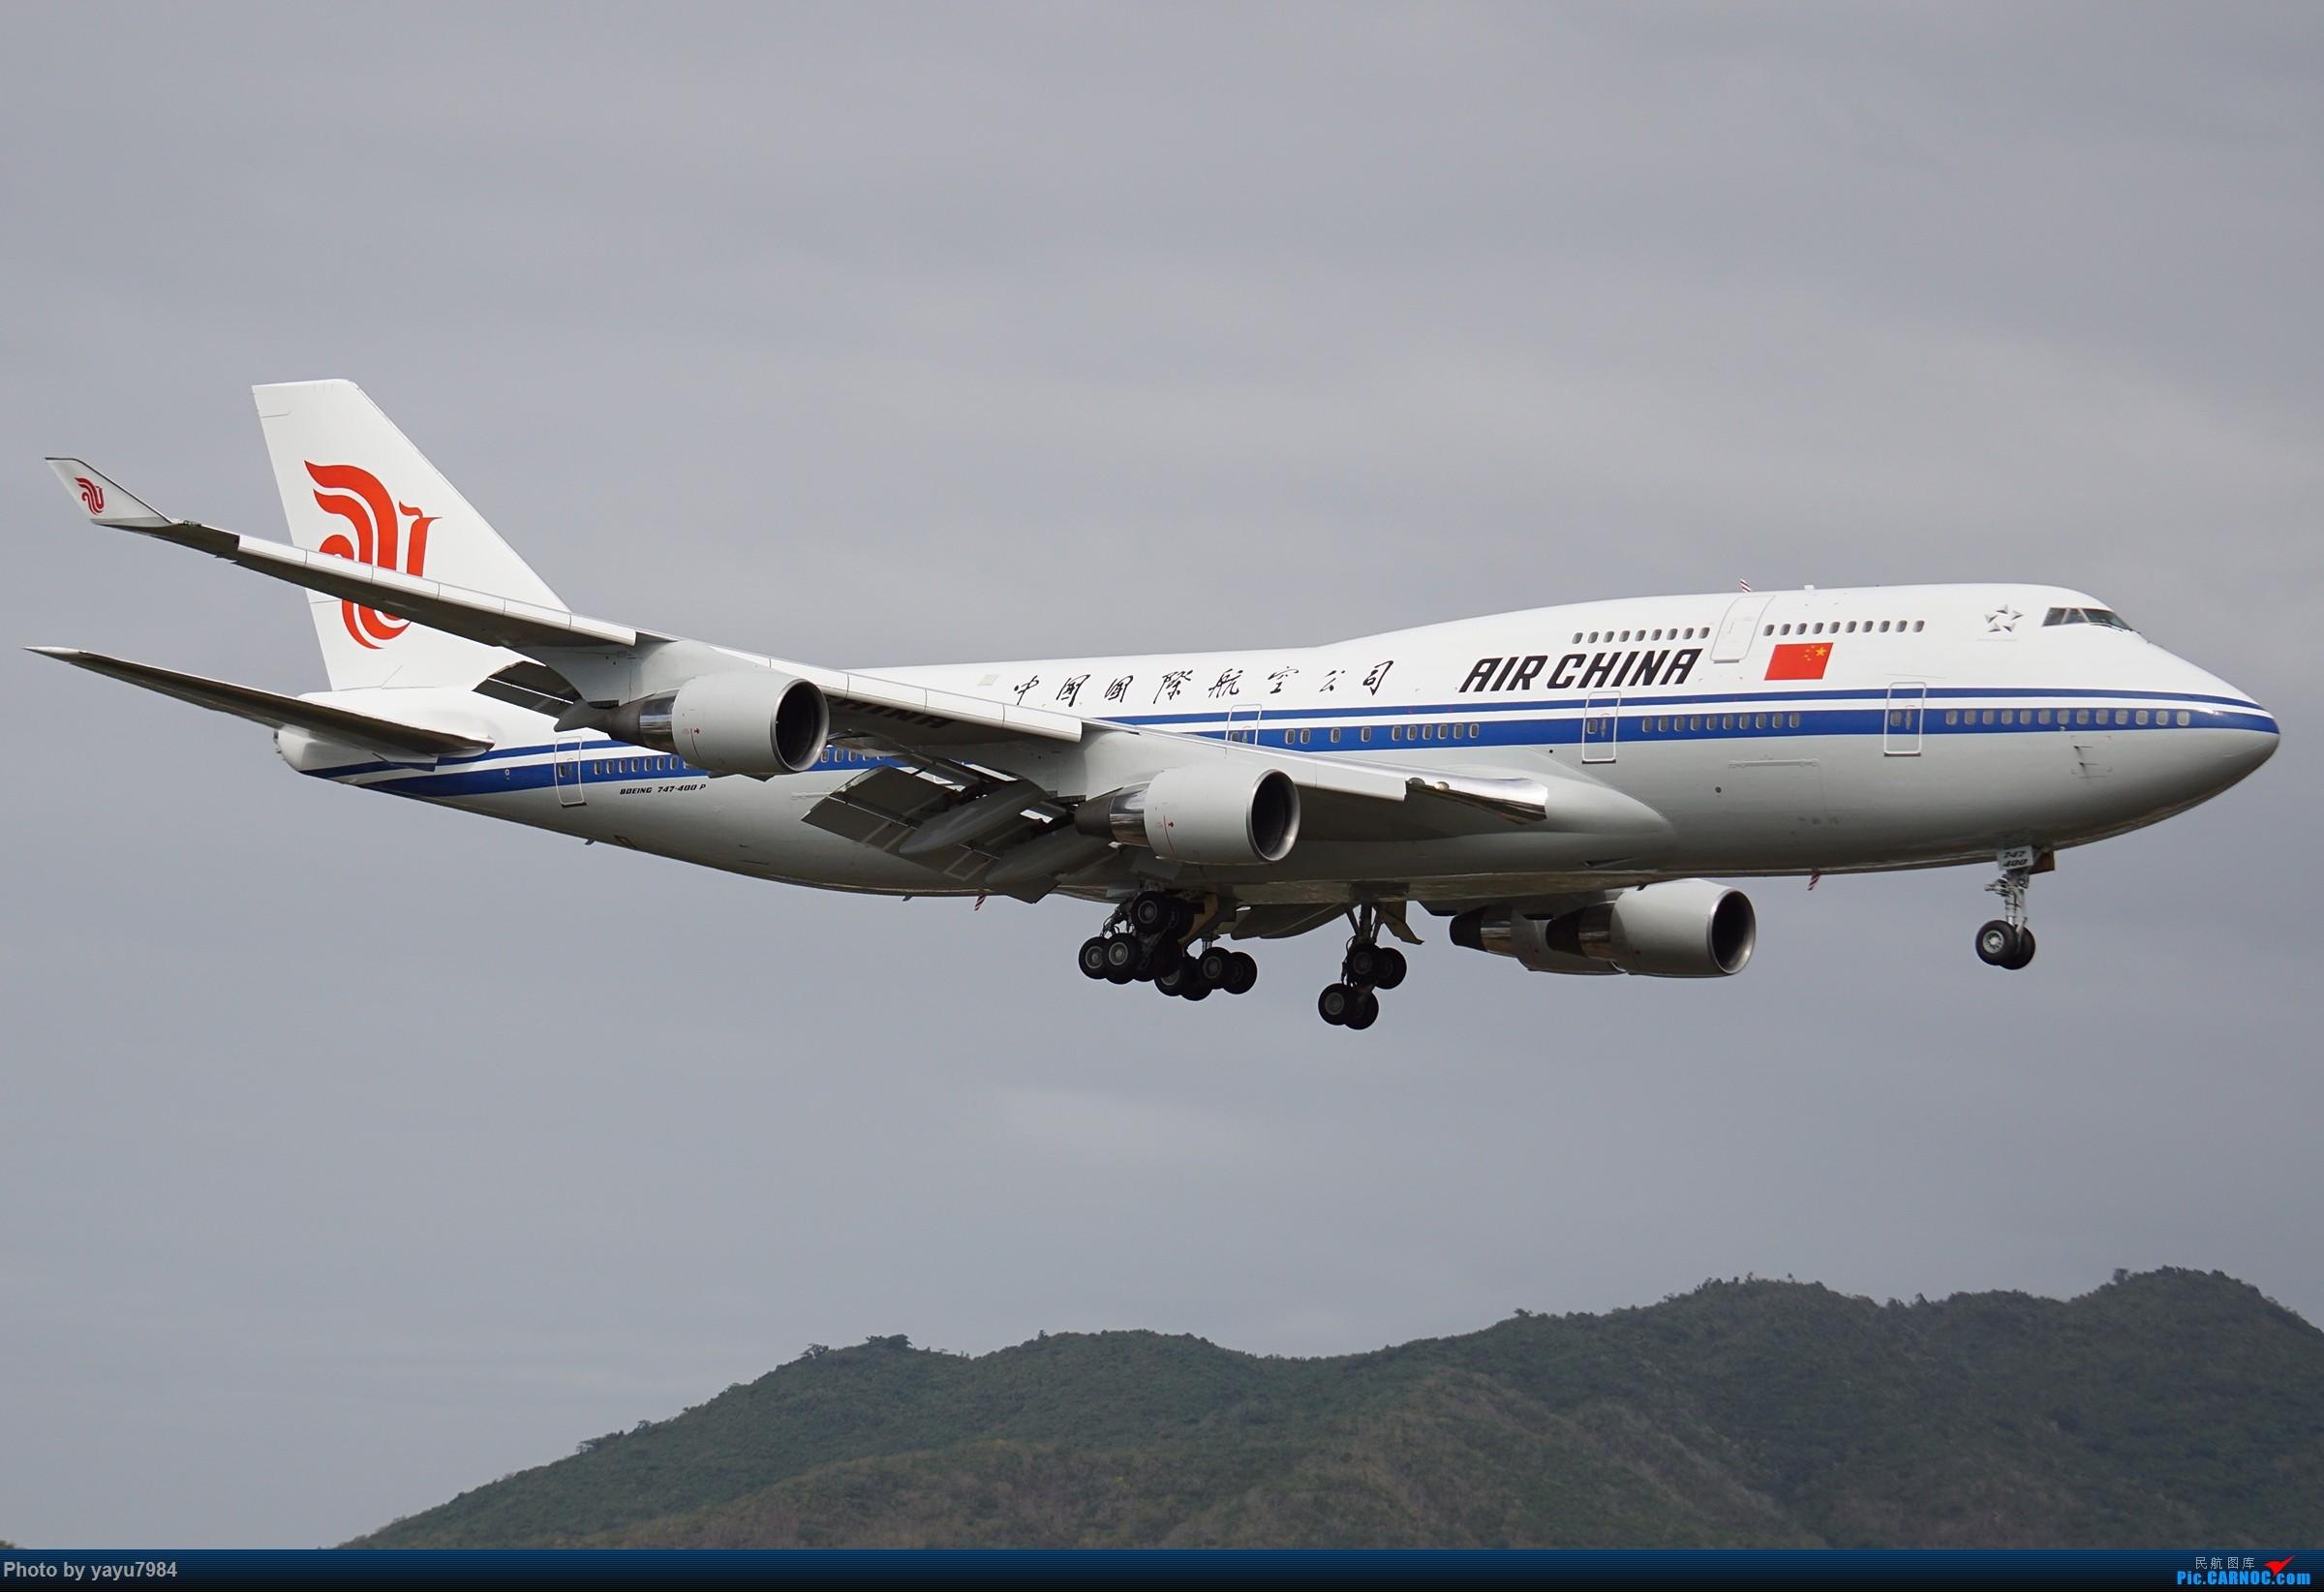 Re:[原创][SYX] 回国首拍,春运高峰时段的三亚凤凰国际机场 BOEING 747-400 B-2447 中国三亚凤凰国际机场